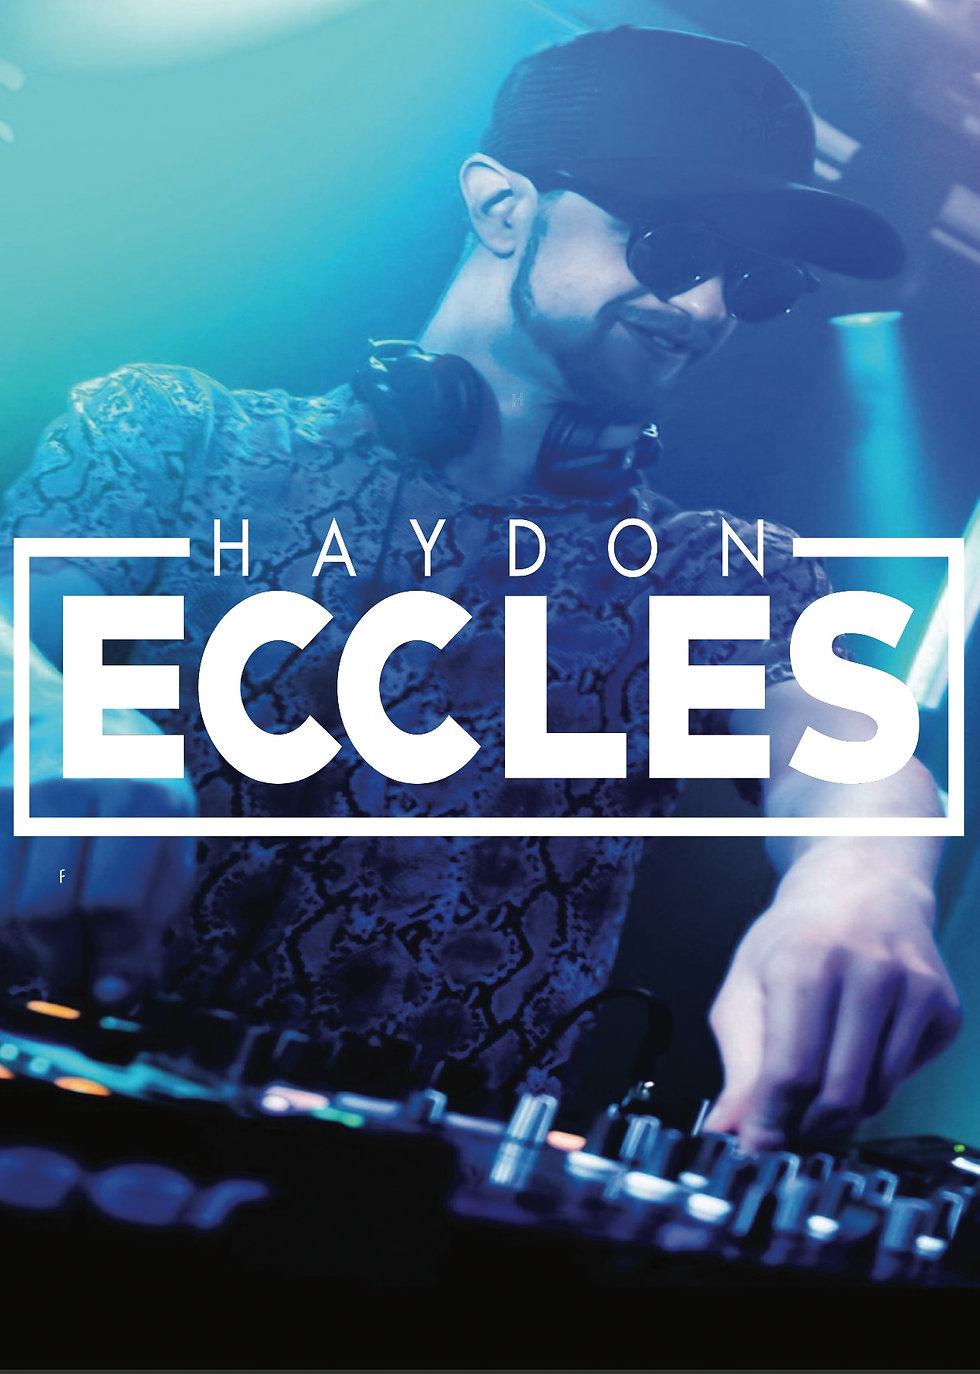 DJ Haydon Eccles - EPK-merged (dragged)